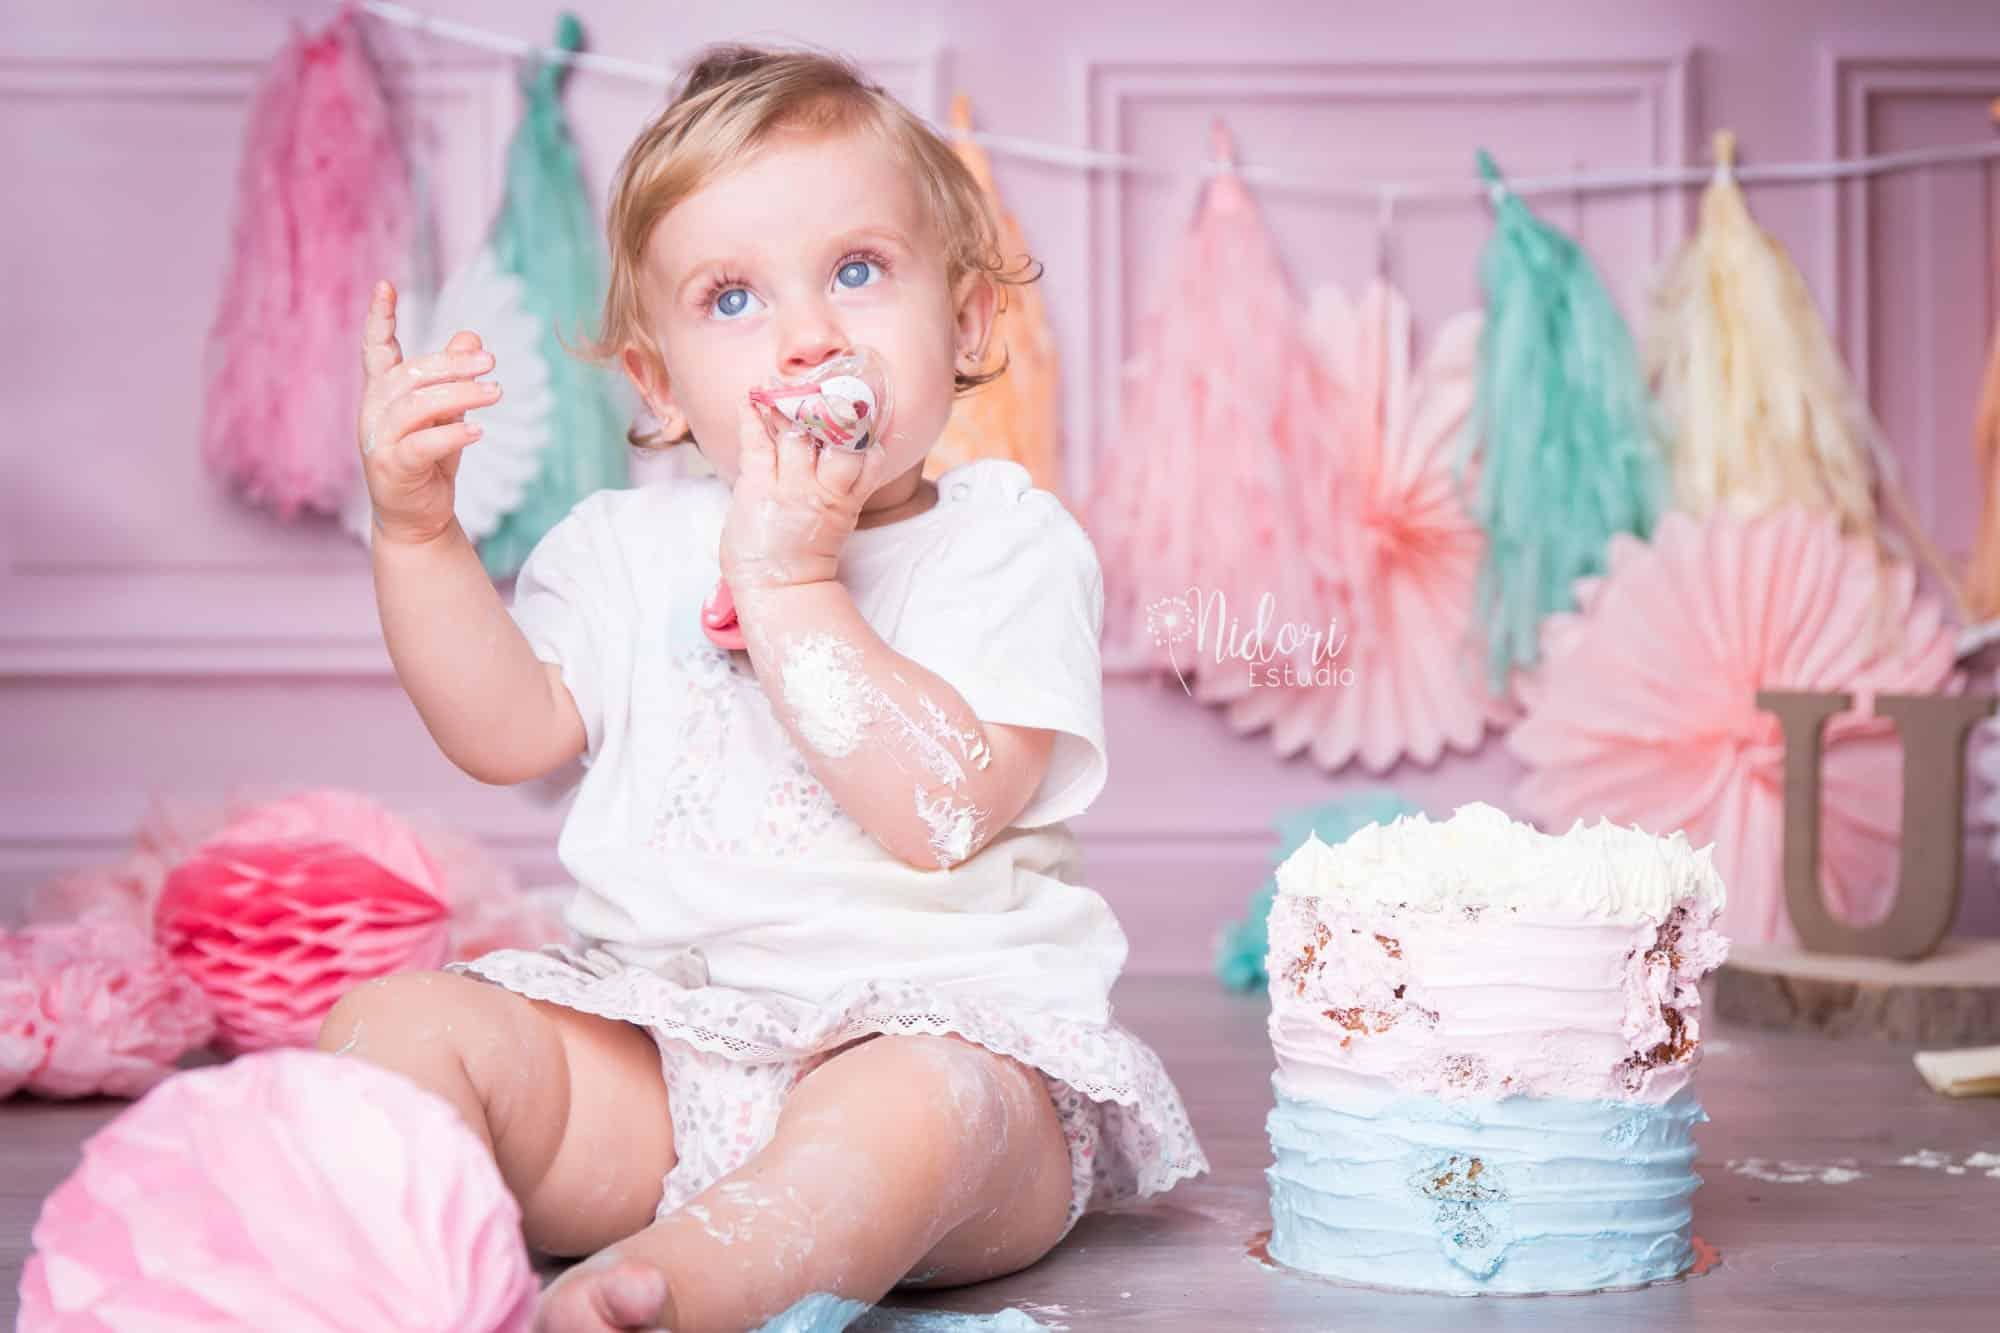 smash-cake-cumpleaños-tarta-fotografia-niños-bebes-nidoriestudio-fotos-valencia-almazora-castellon-españa-spain-12